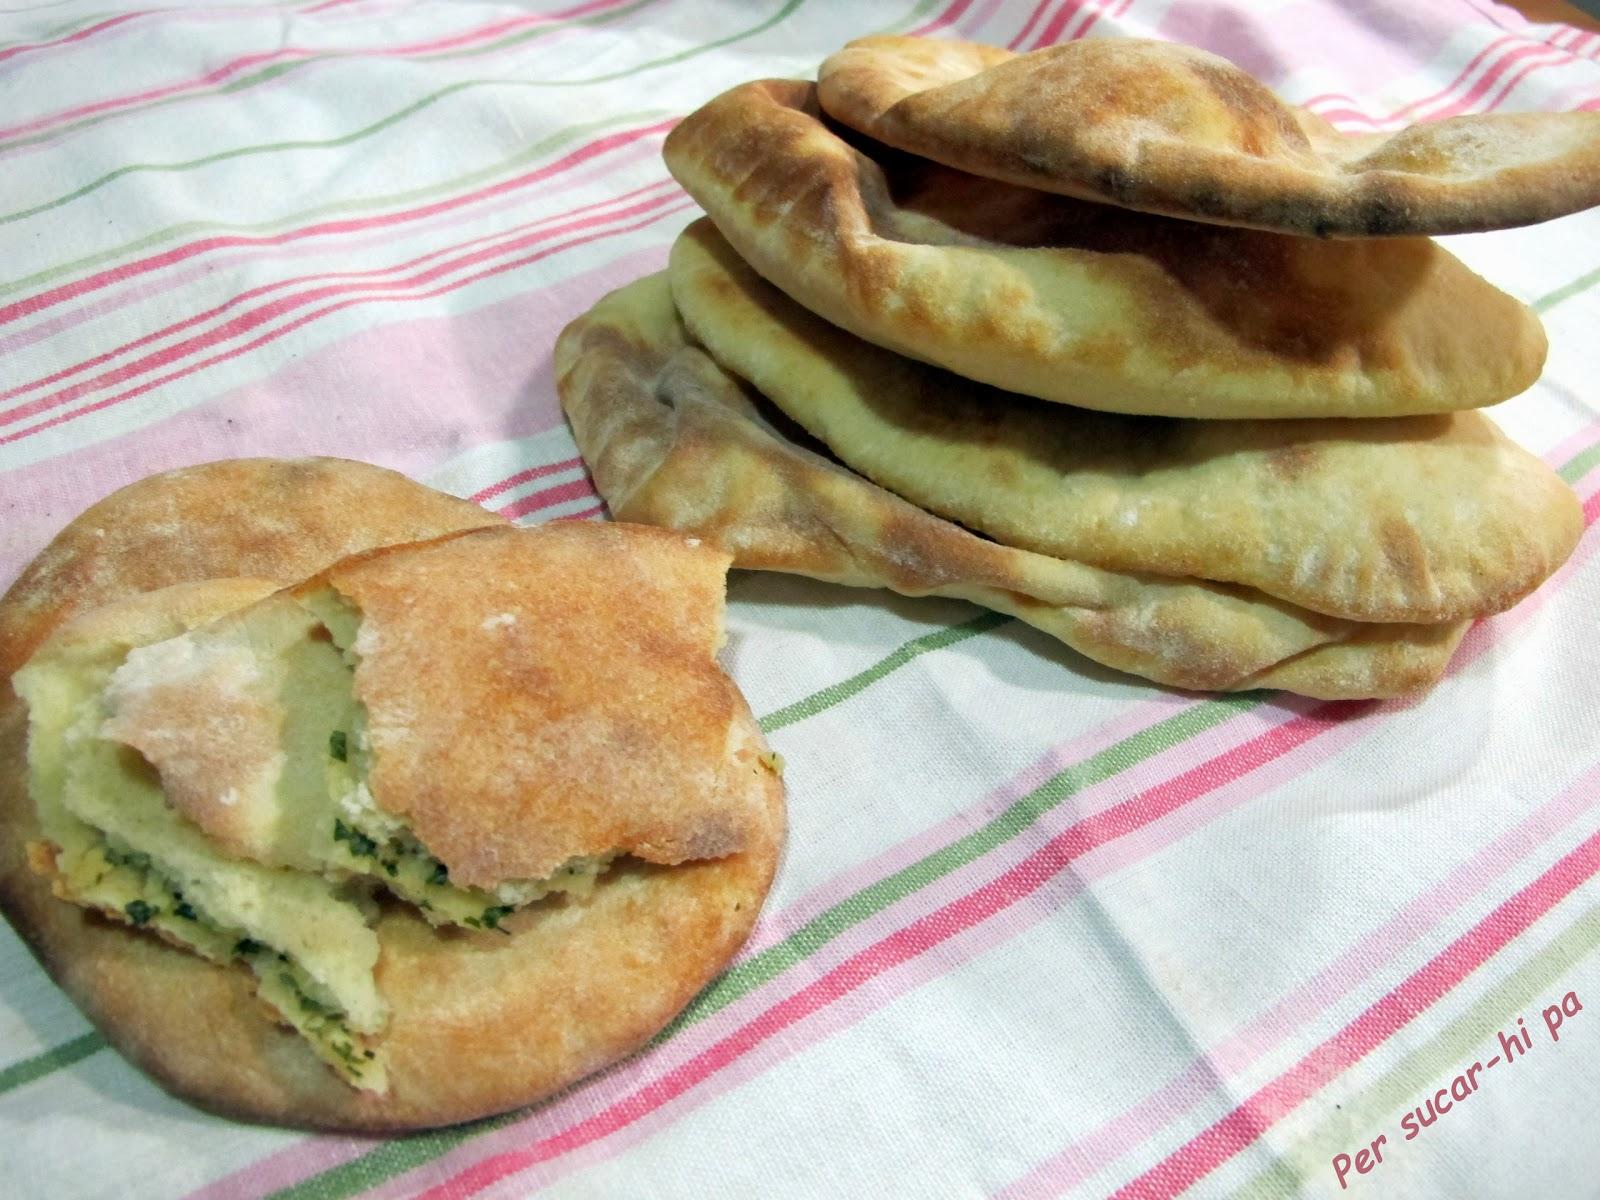 Tres Arandanos Dieta Limpia Casa Limpia Planeta Limpio Cocina - Recetas-vegetarianas-faciles